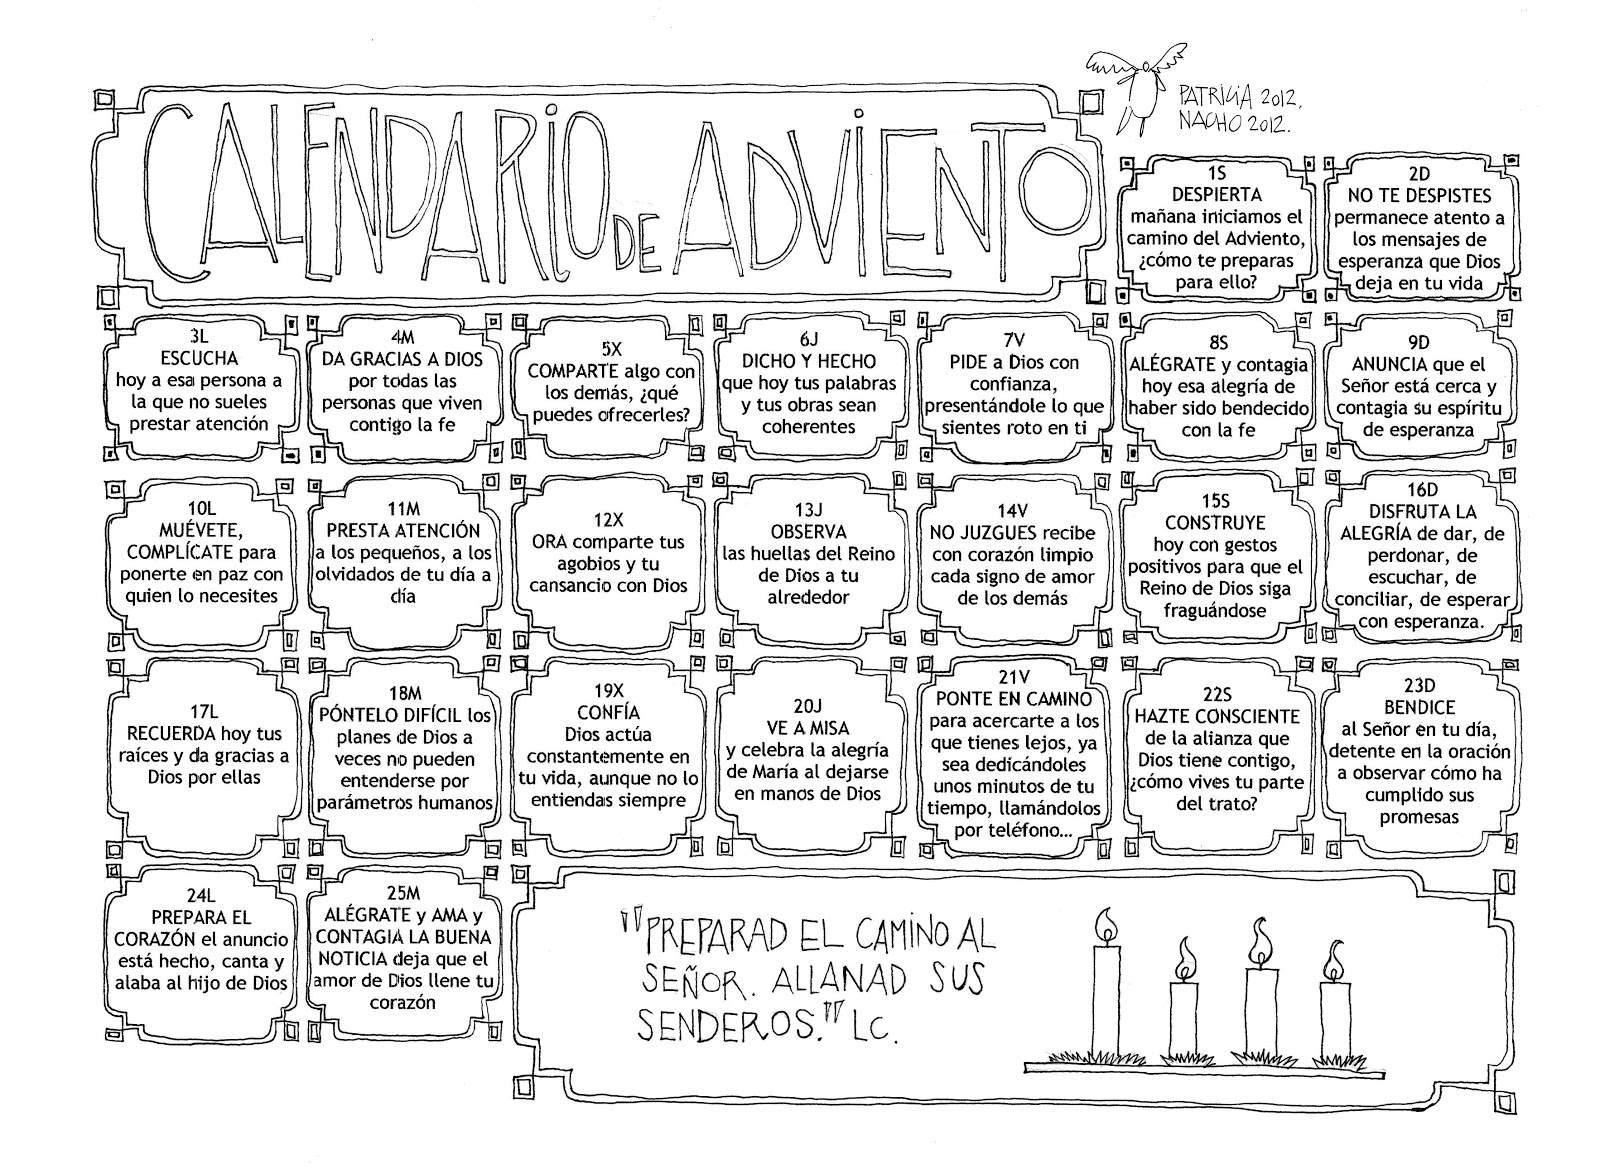 http://odresnuevos.files.wordpress.com/2012/11/calendario-adviento-2012-bn-patricia-rojo.jpg